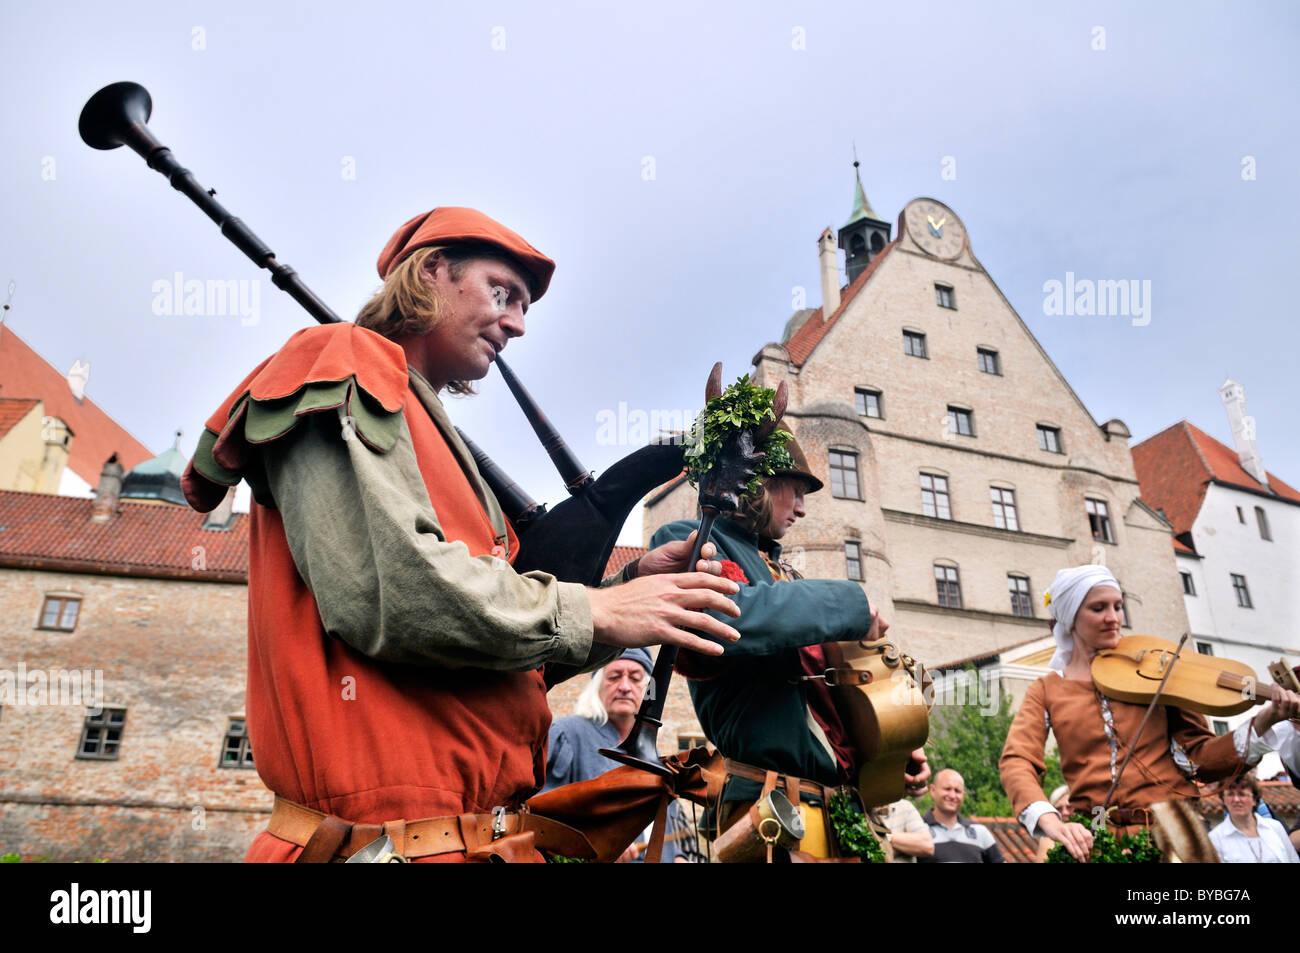 I musicisti suonano strumenti a Landshut Wedding 2009, un grande corteo medievale, Landshut, Bassa Baviera, Baviera Immagini Stock